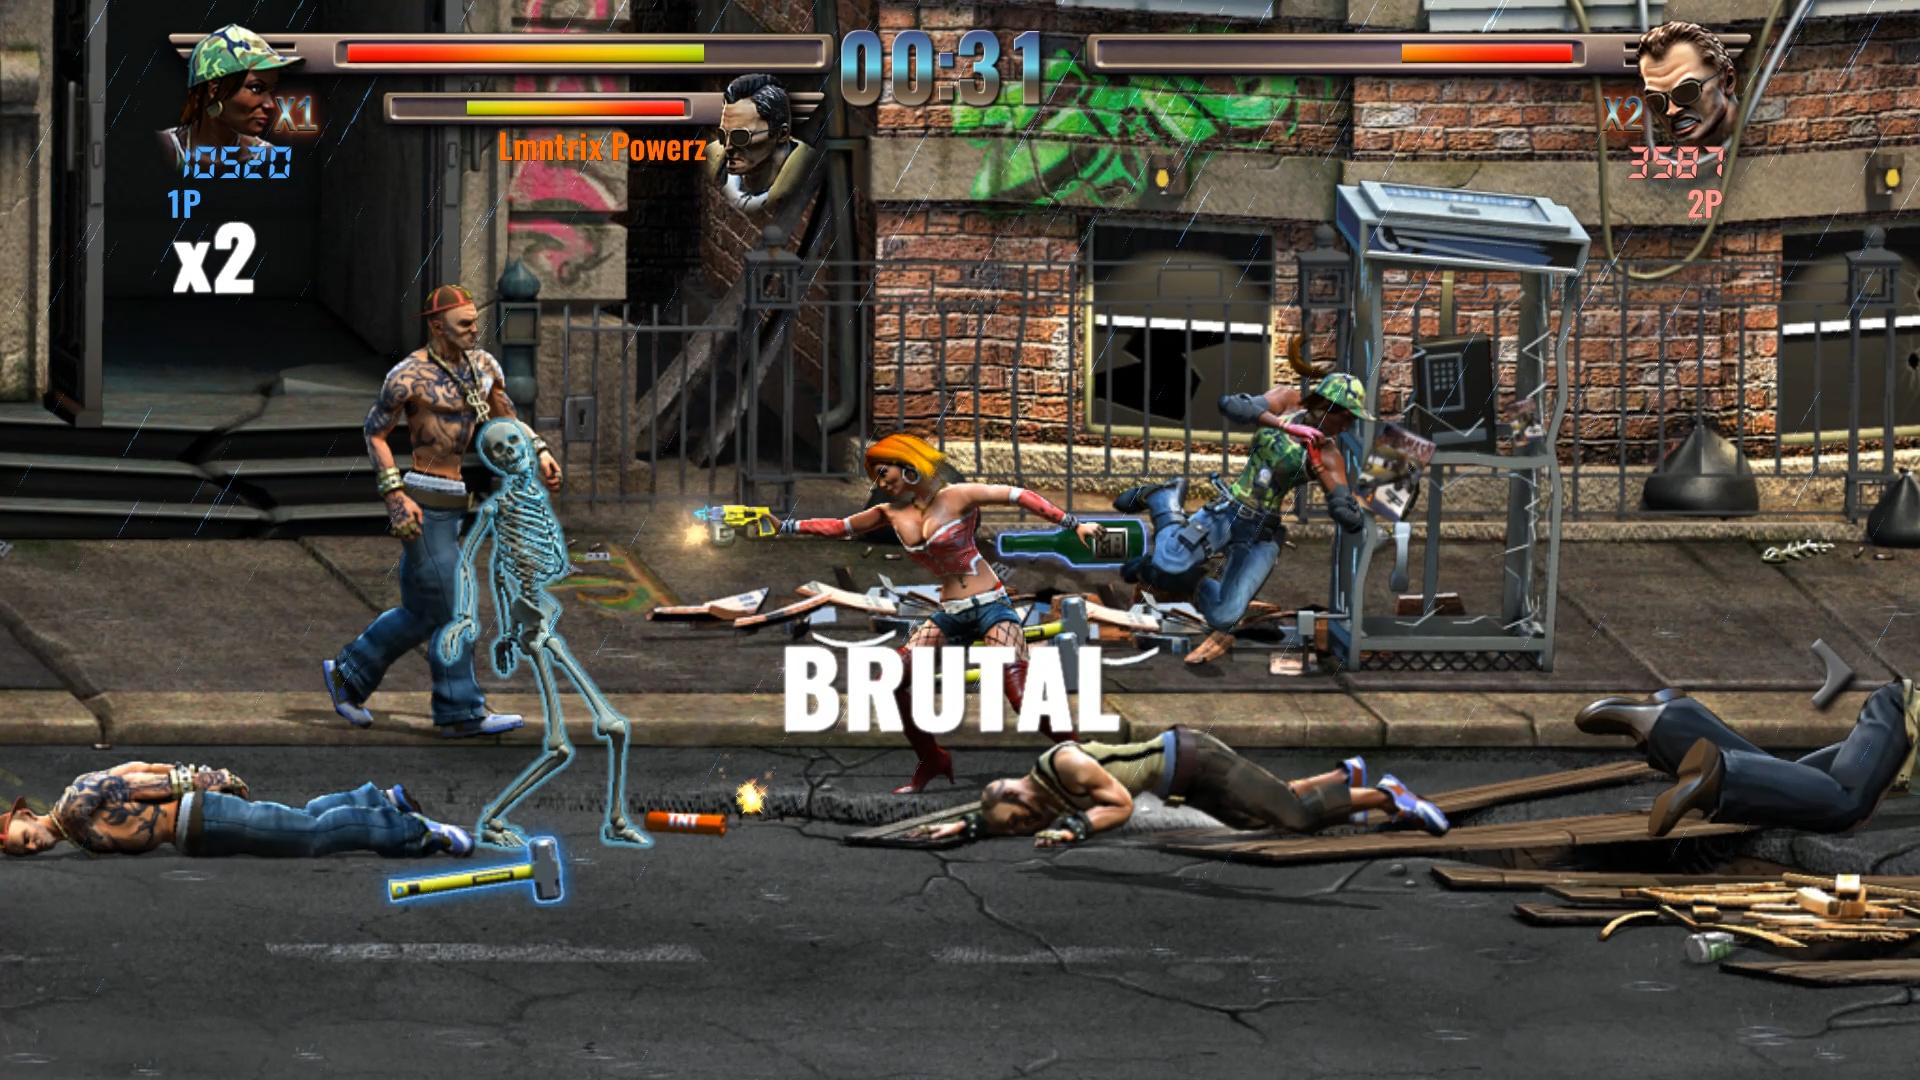 raging_justice-3.jpg - -